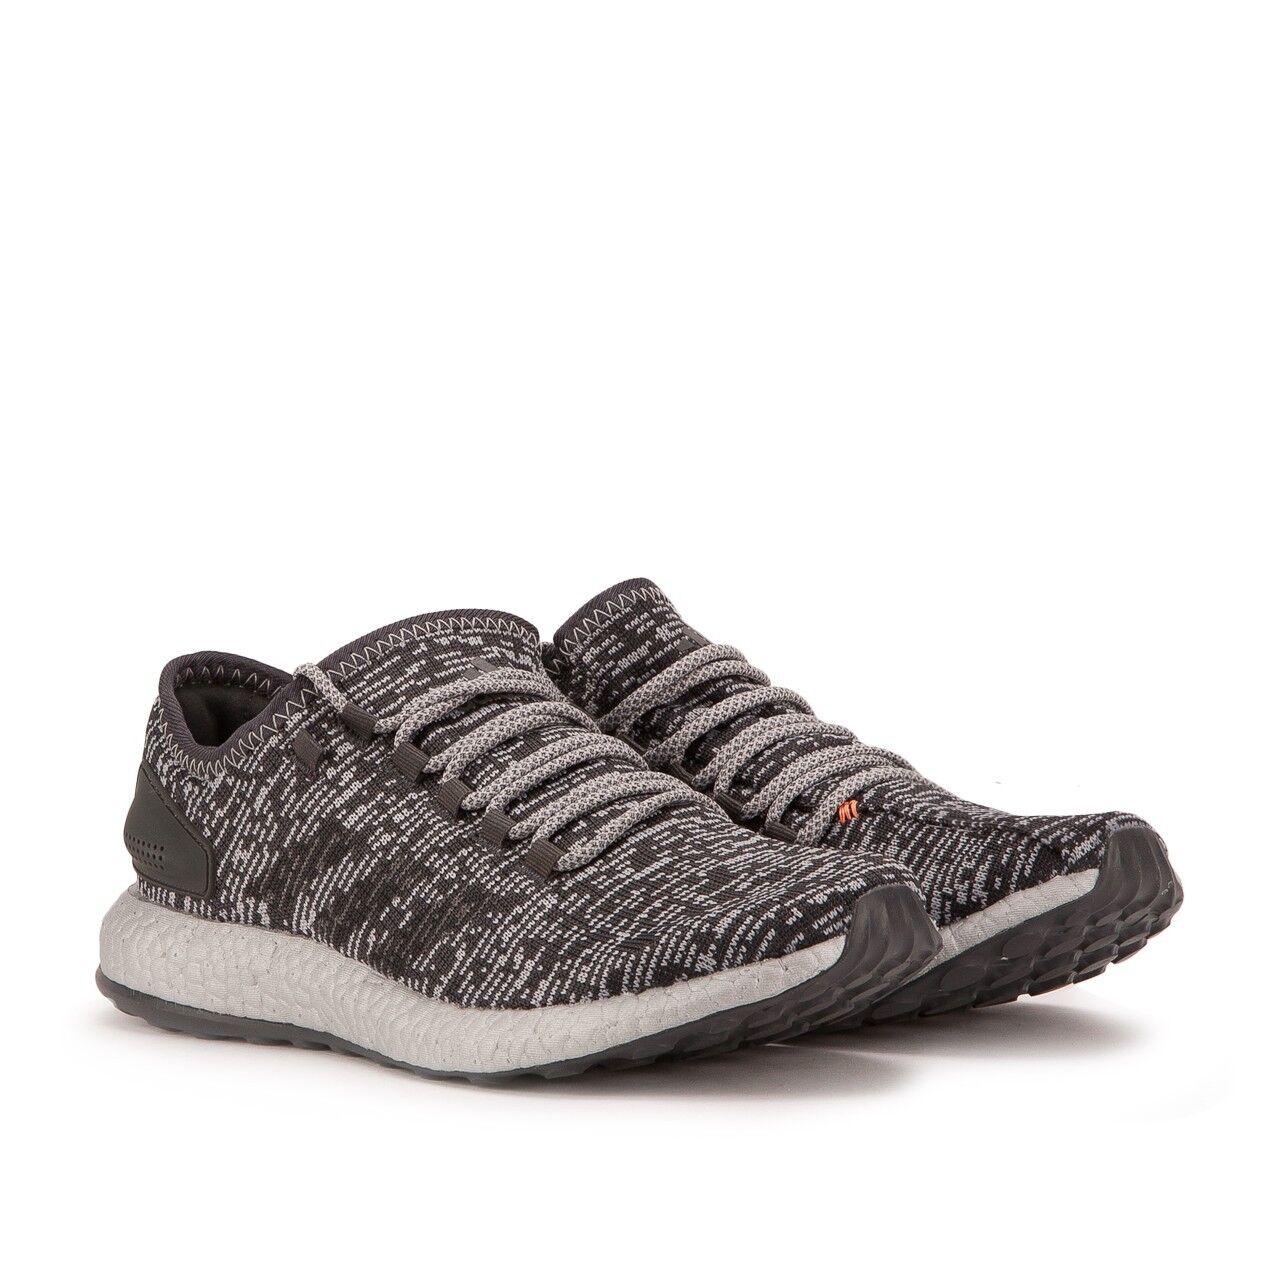 Adidas Running Men's Pure Boost LTD Shoes Comfortable